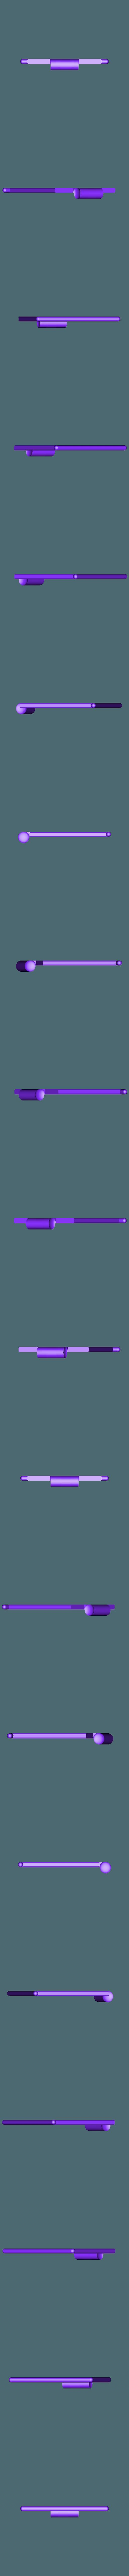 InternoVsBase.stl Download free STL file Adjustable Laptop Stand [WIP] • 3D printable template, Kliffom